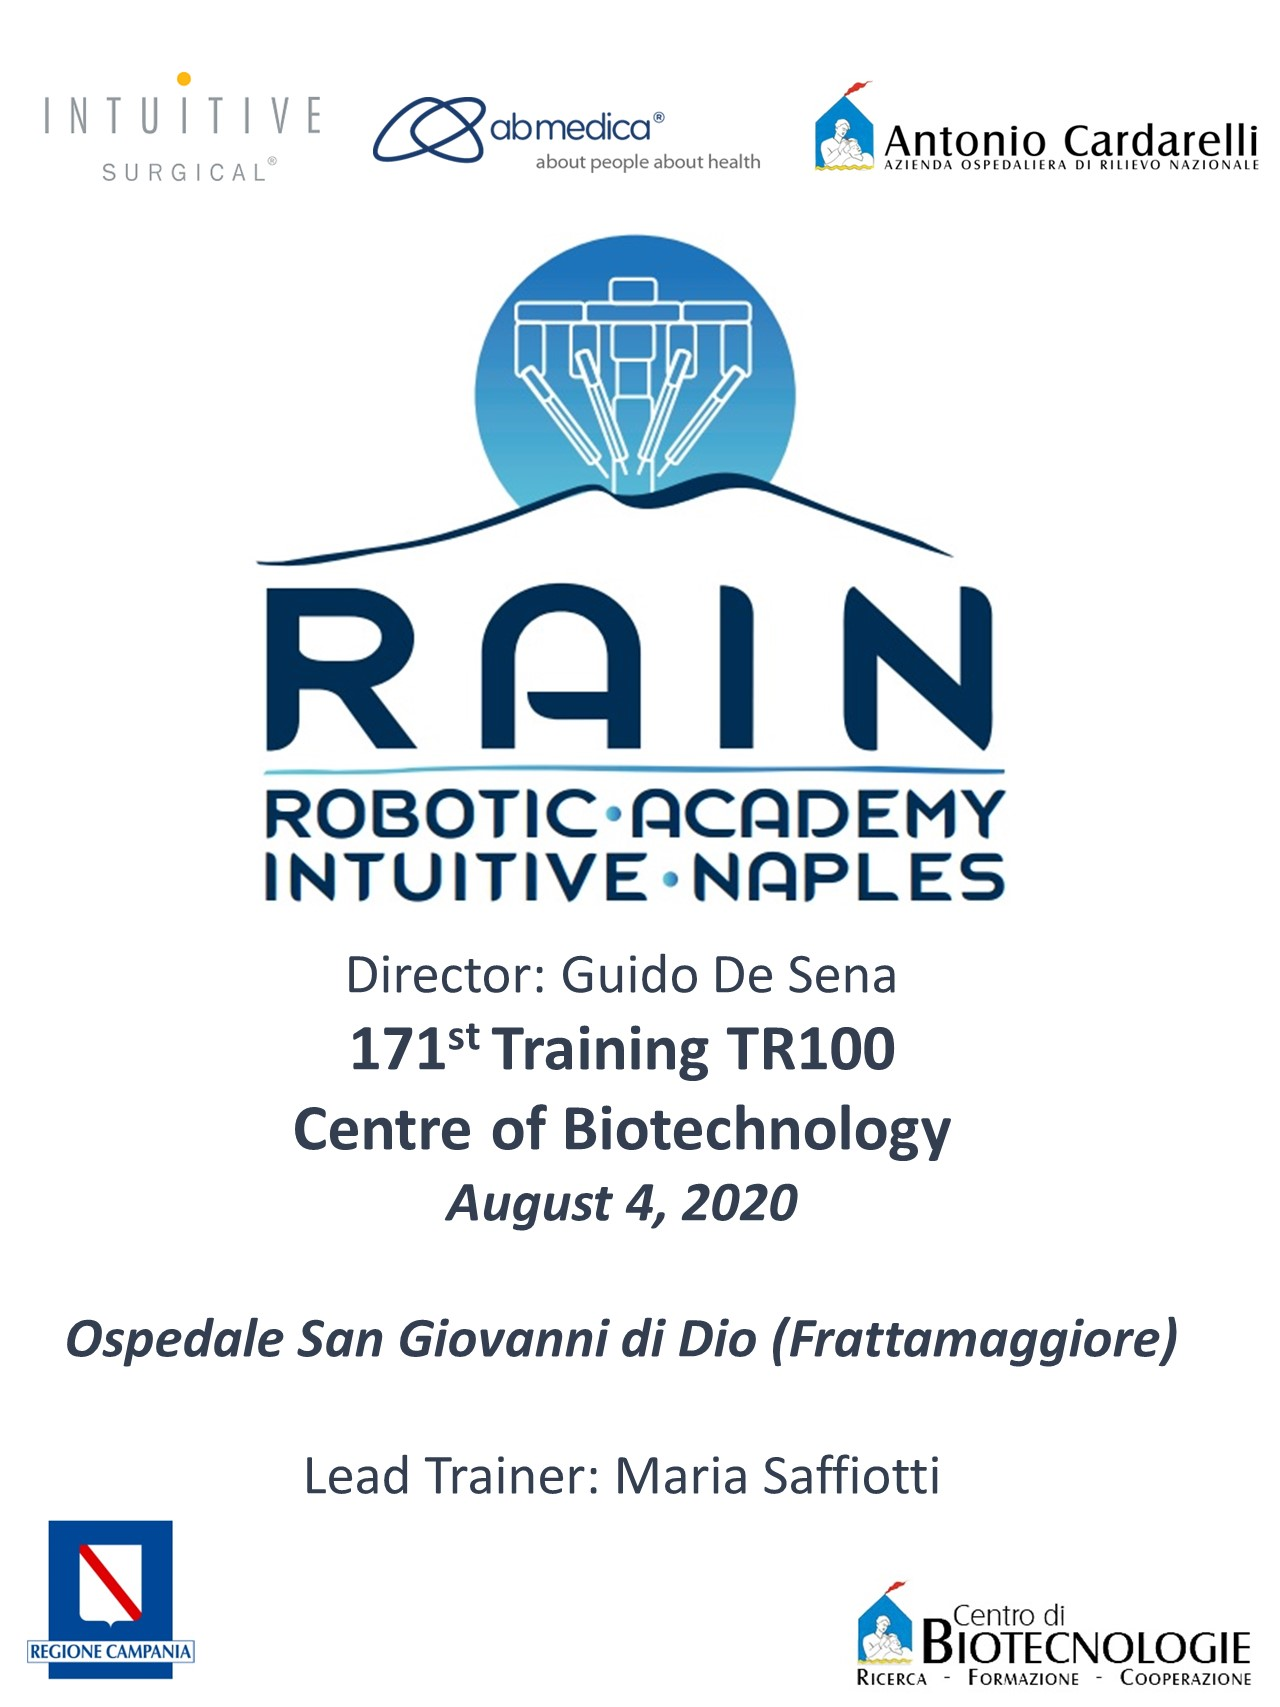 RAIN - Robotic Academy Intuitive Naples - 171th Training TR100